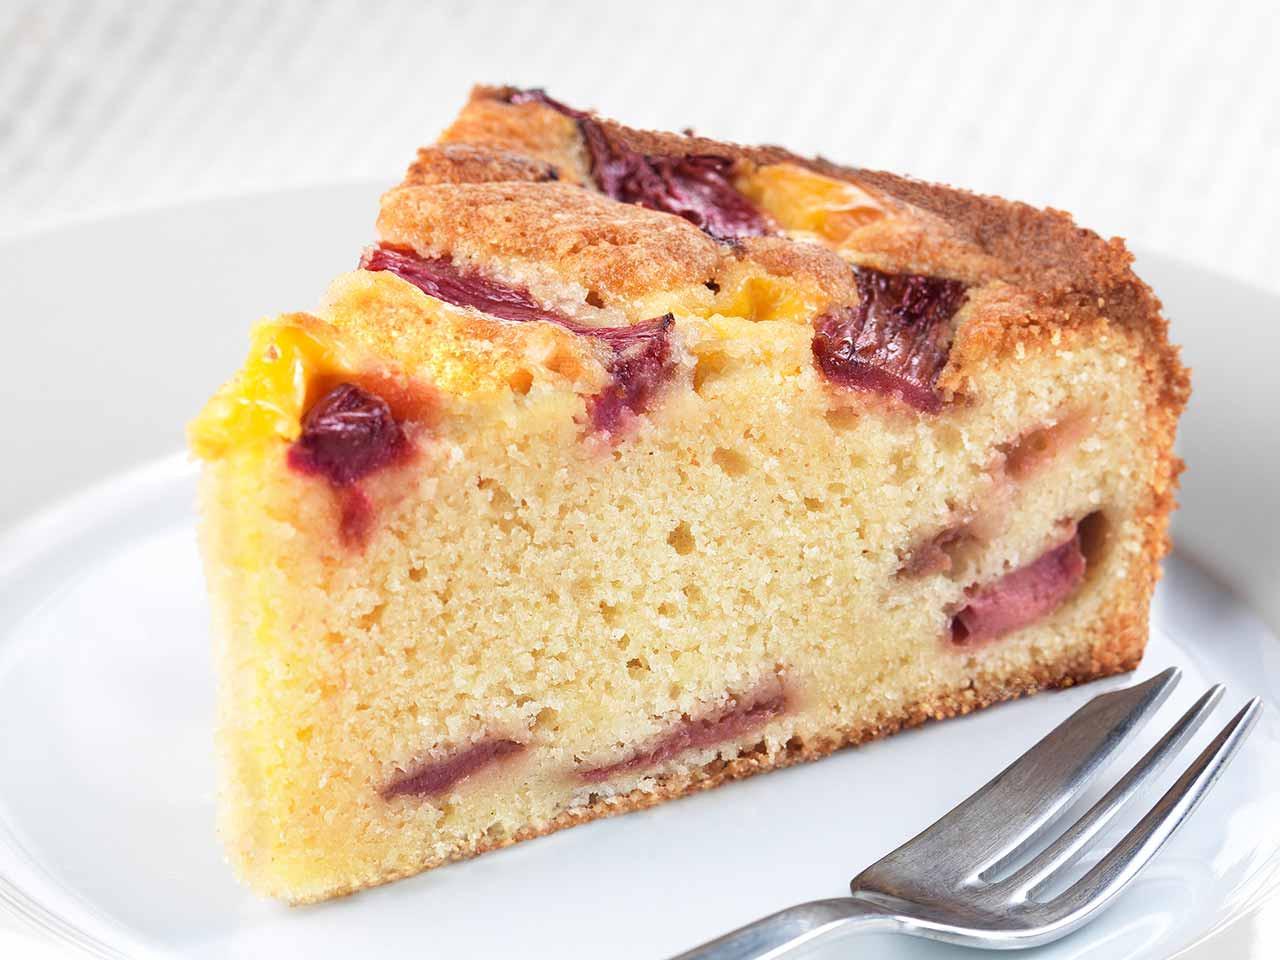 Rhubarb Dessert Recipes  6 delicious rhubarb dessert ideas Saga